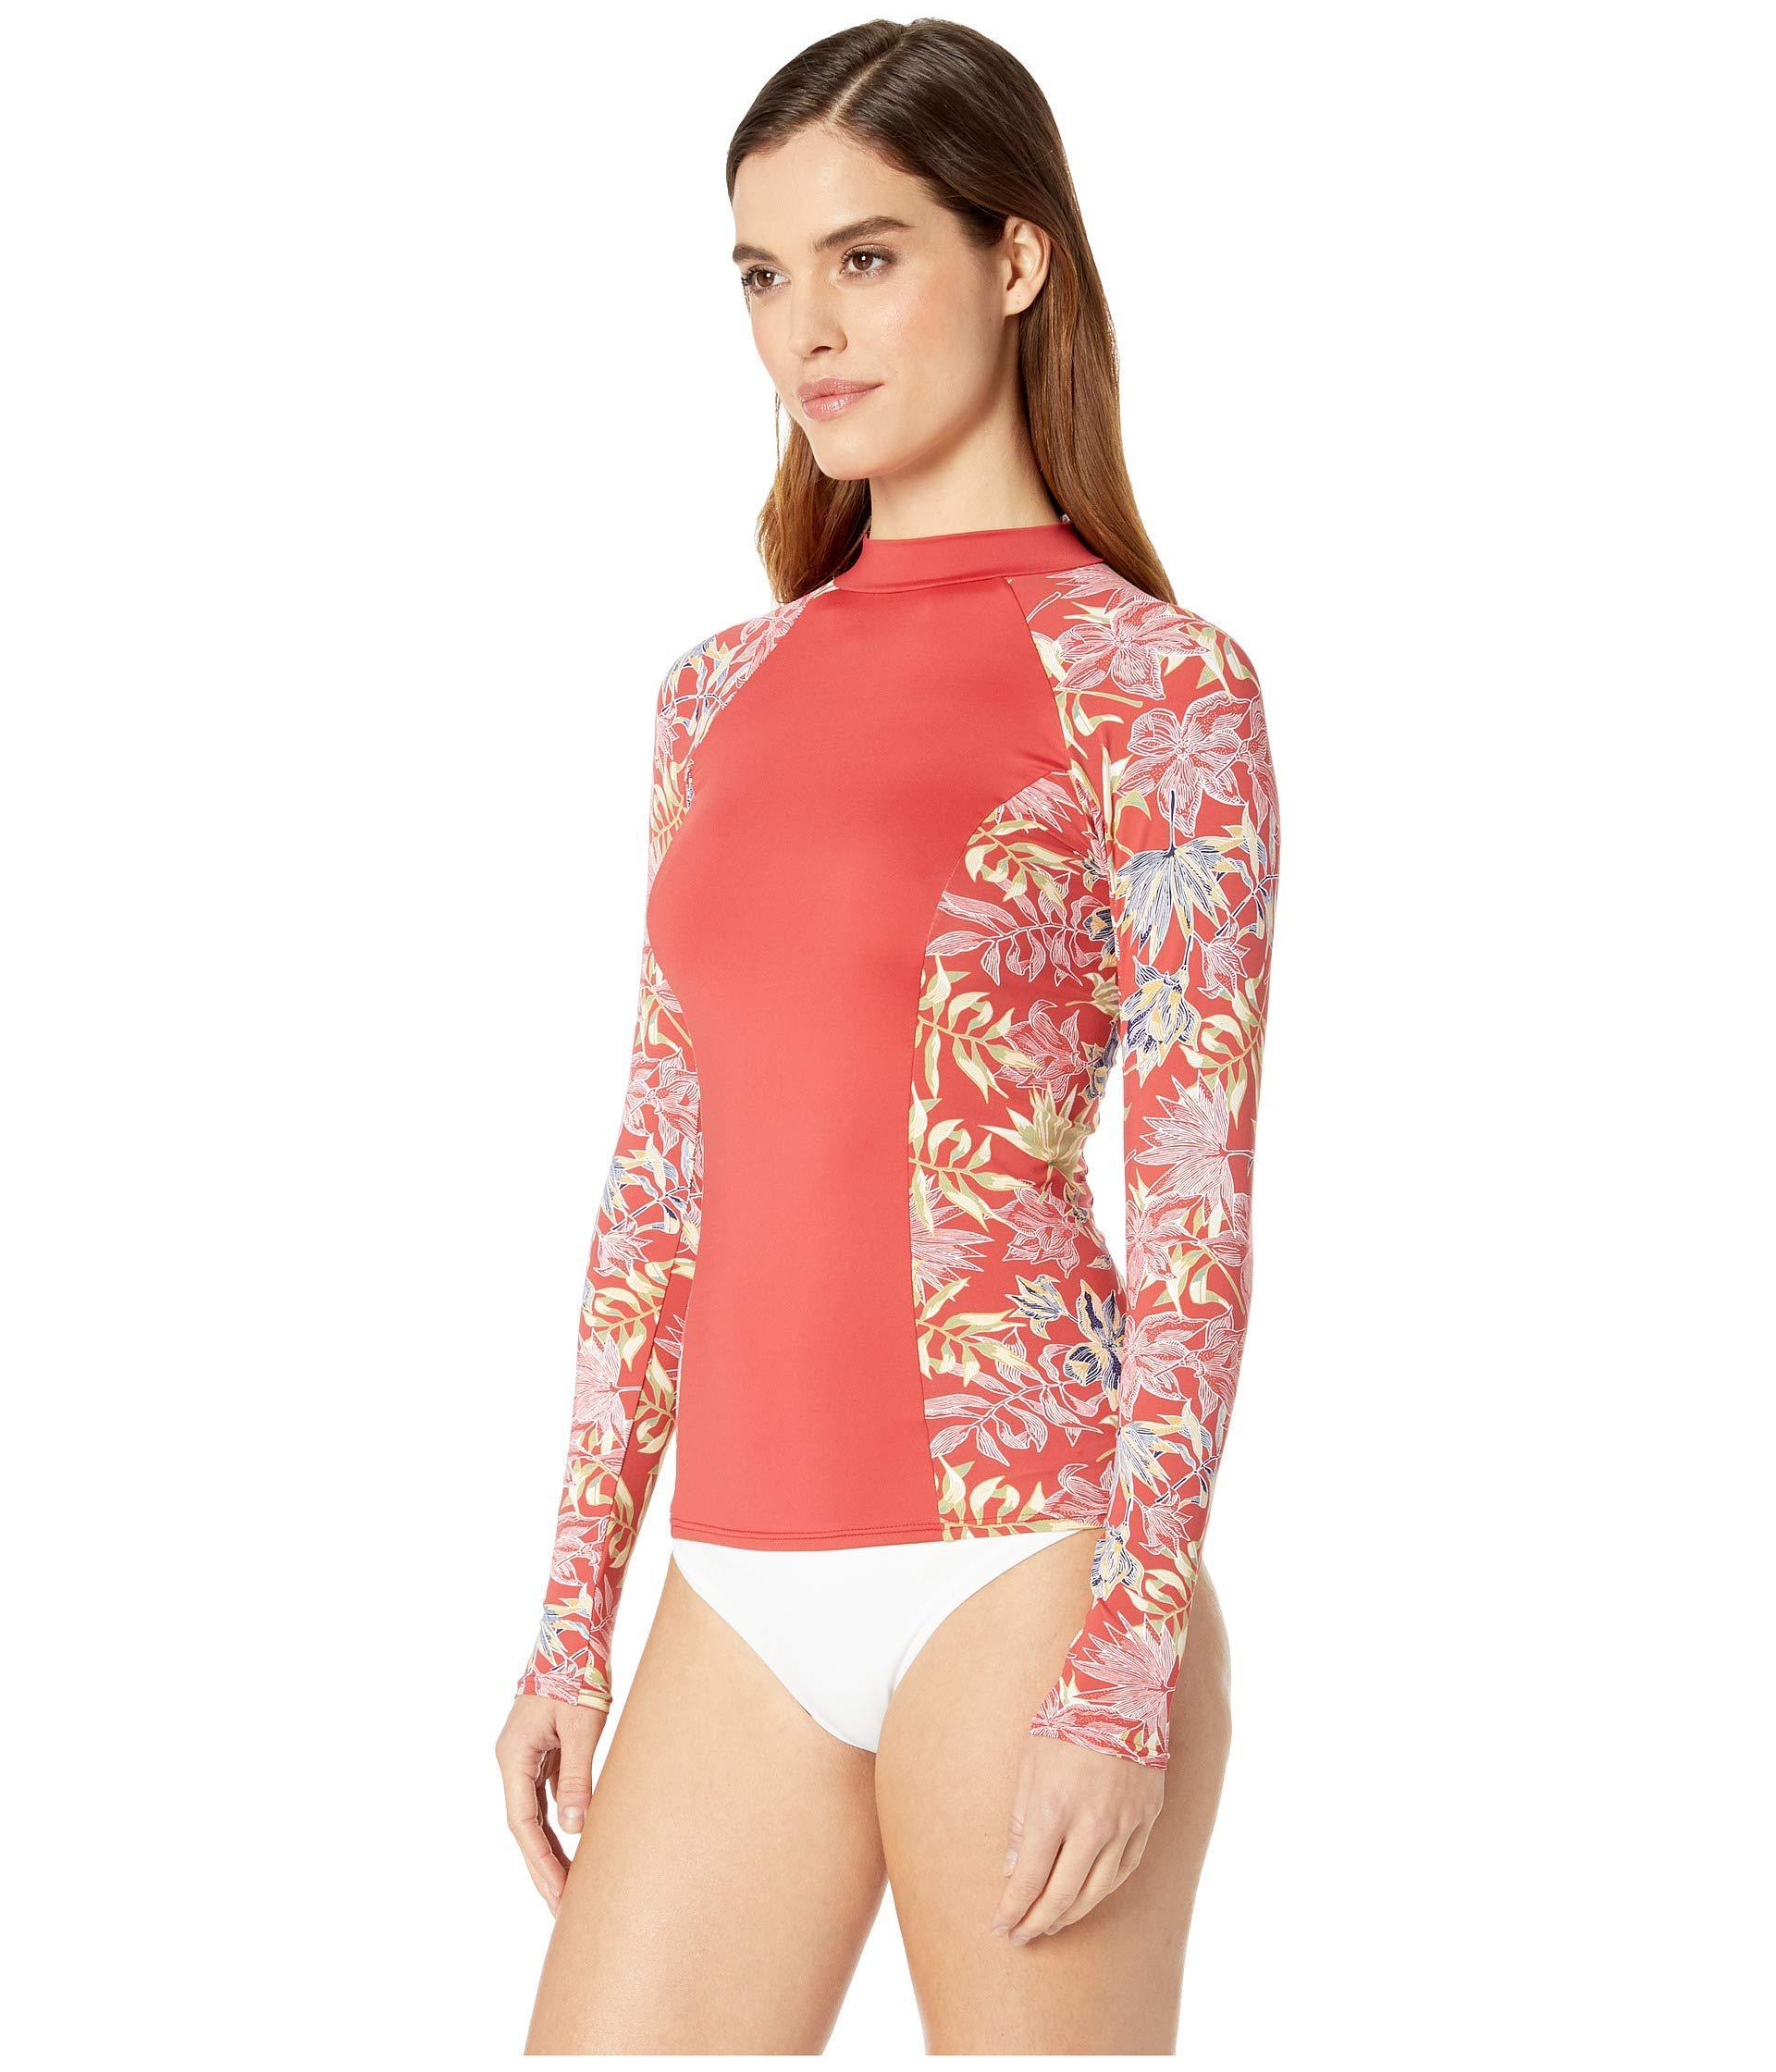 09bbb035f9 Lyst - Roxy Printed Softly Love Long Sleeve Rashguard (cardinal Vivian  Small Swim) Women s Swimwear in Red